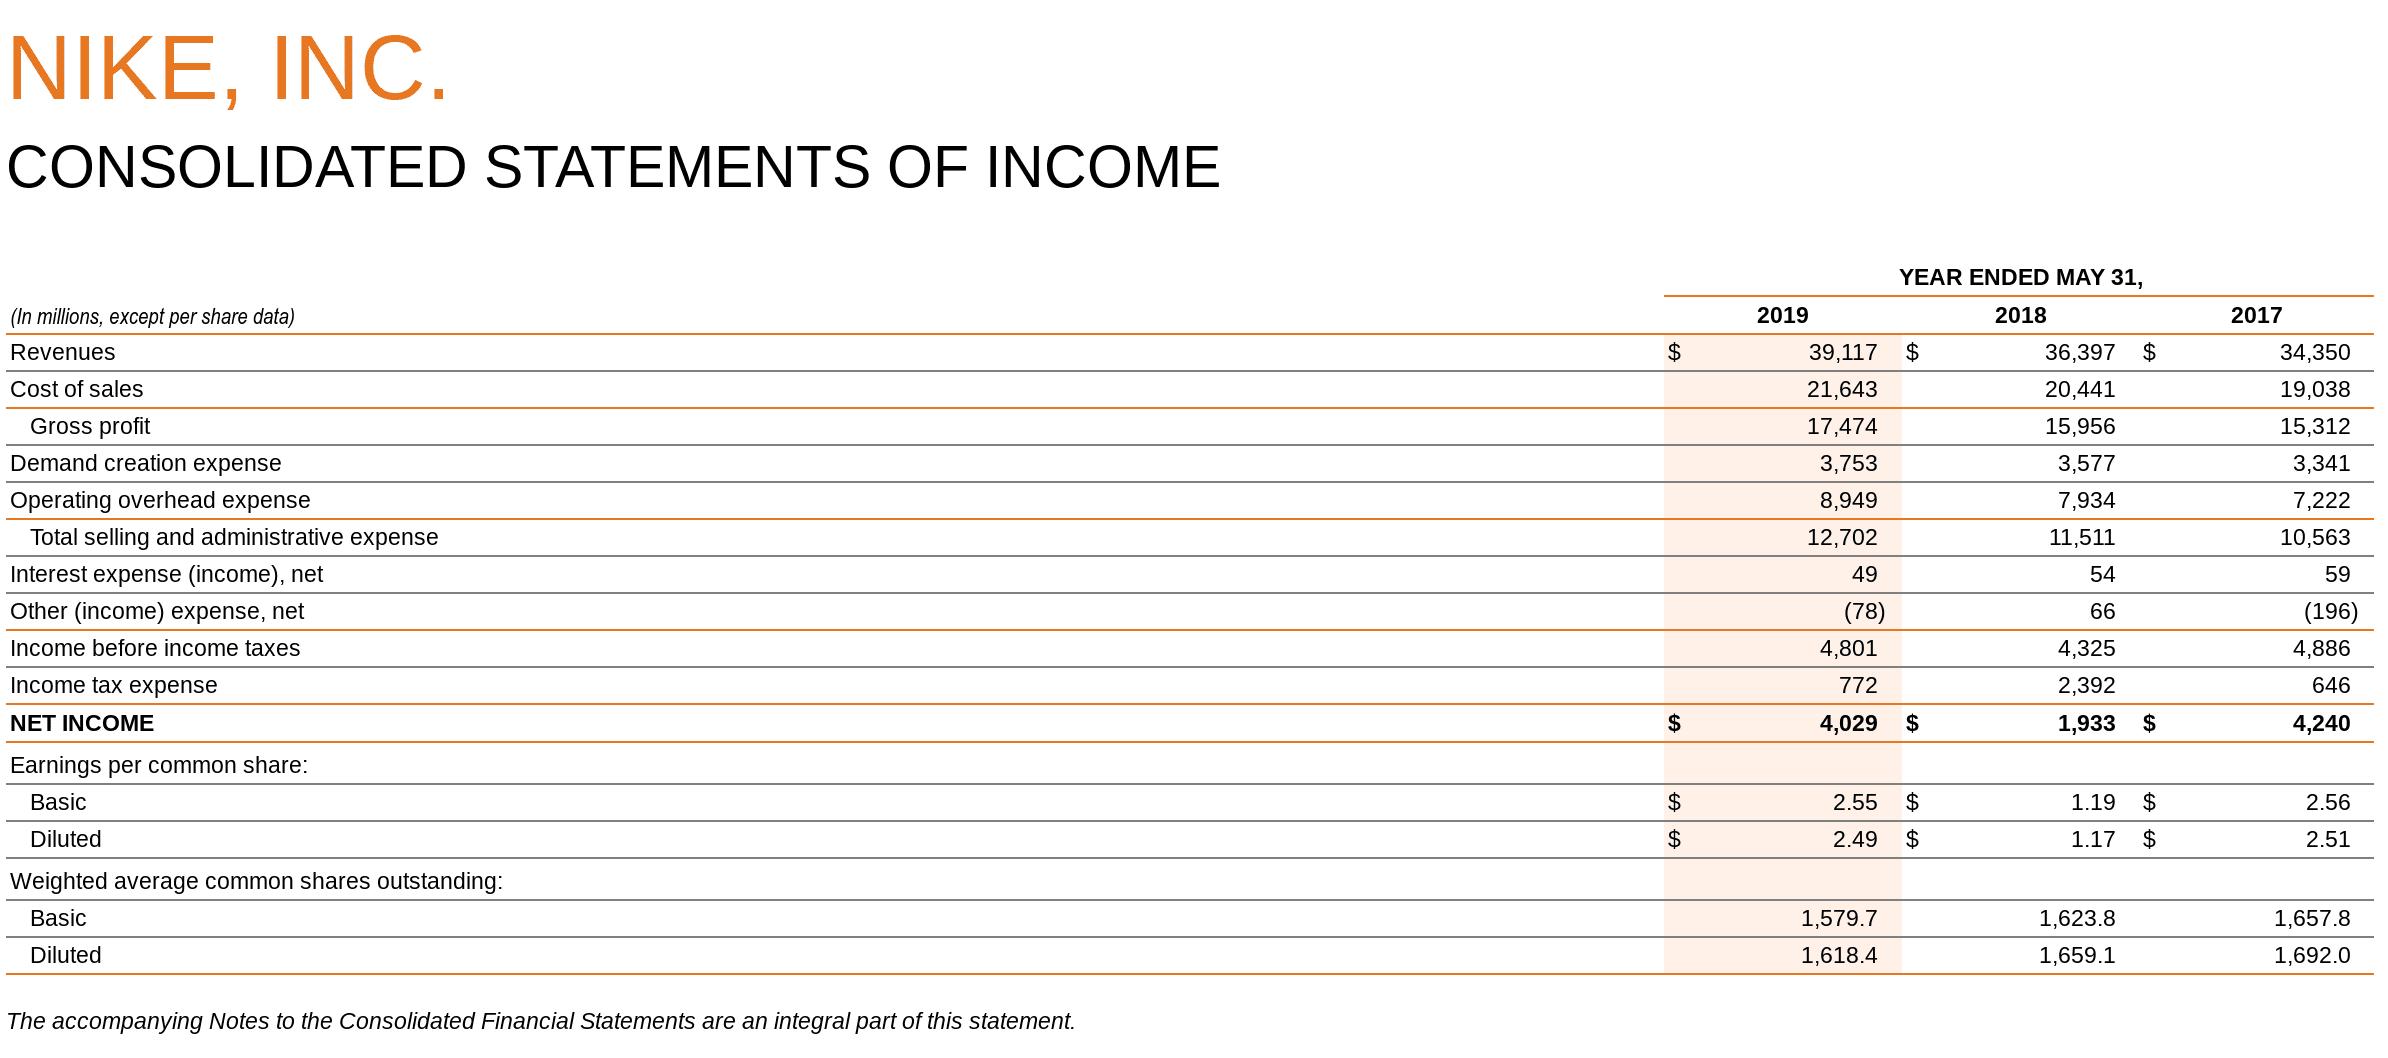 Morbosidad Colibrí asentamiento  مثابرة الانحراف التحرير nike financial statements 2018 -  peoriaorchidsociety.org